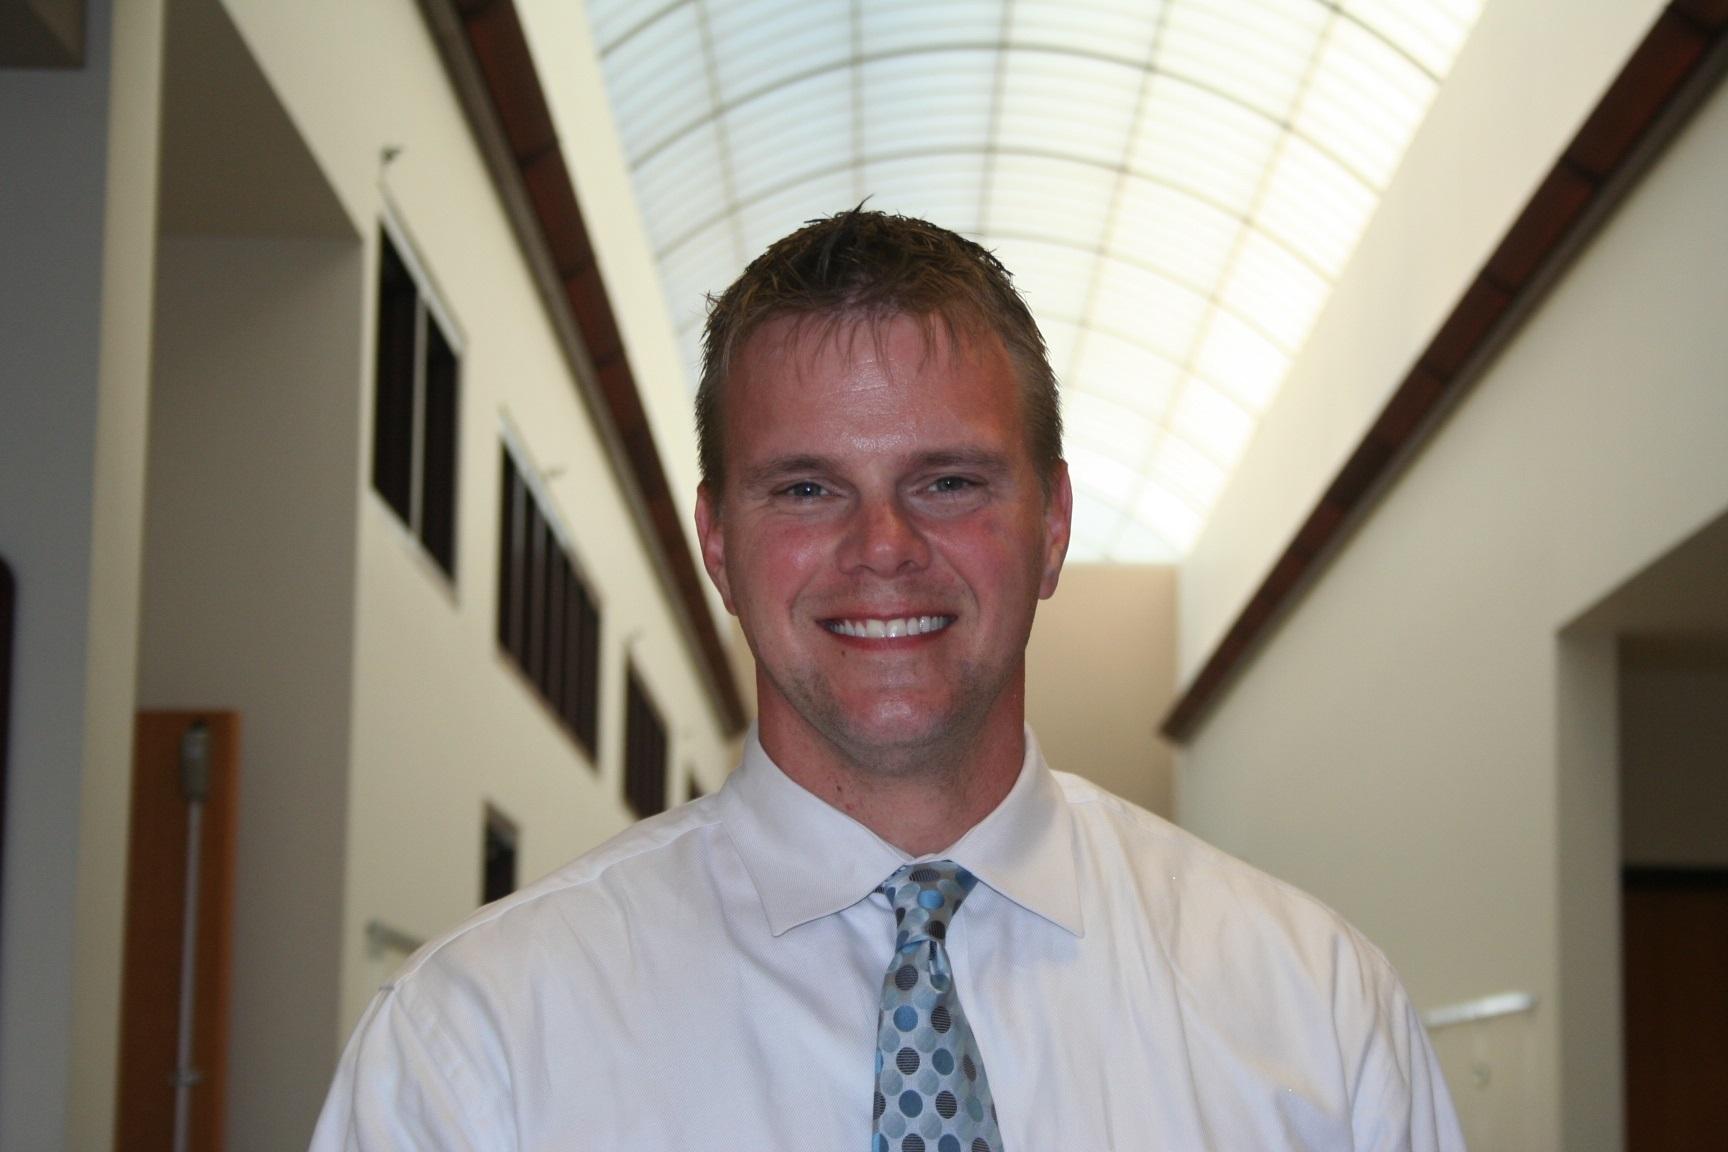 Plainfield Academy Principal Tod Schnowske